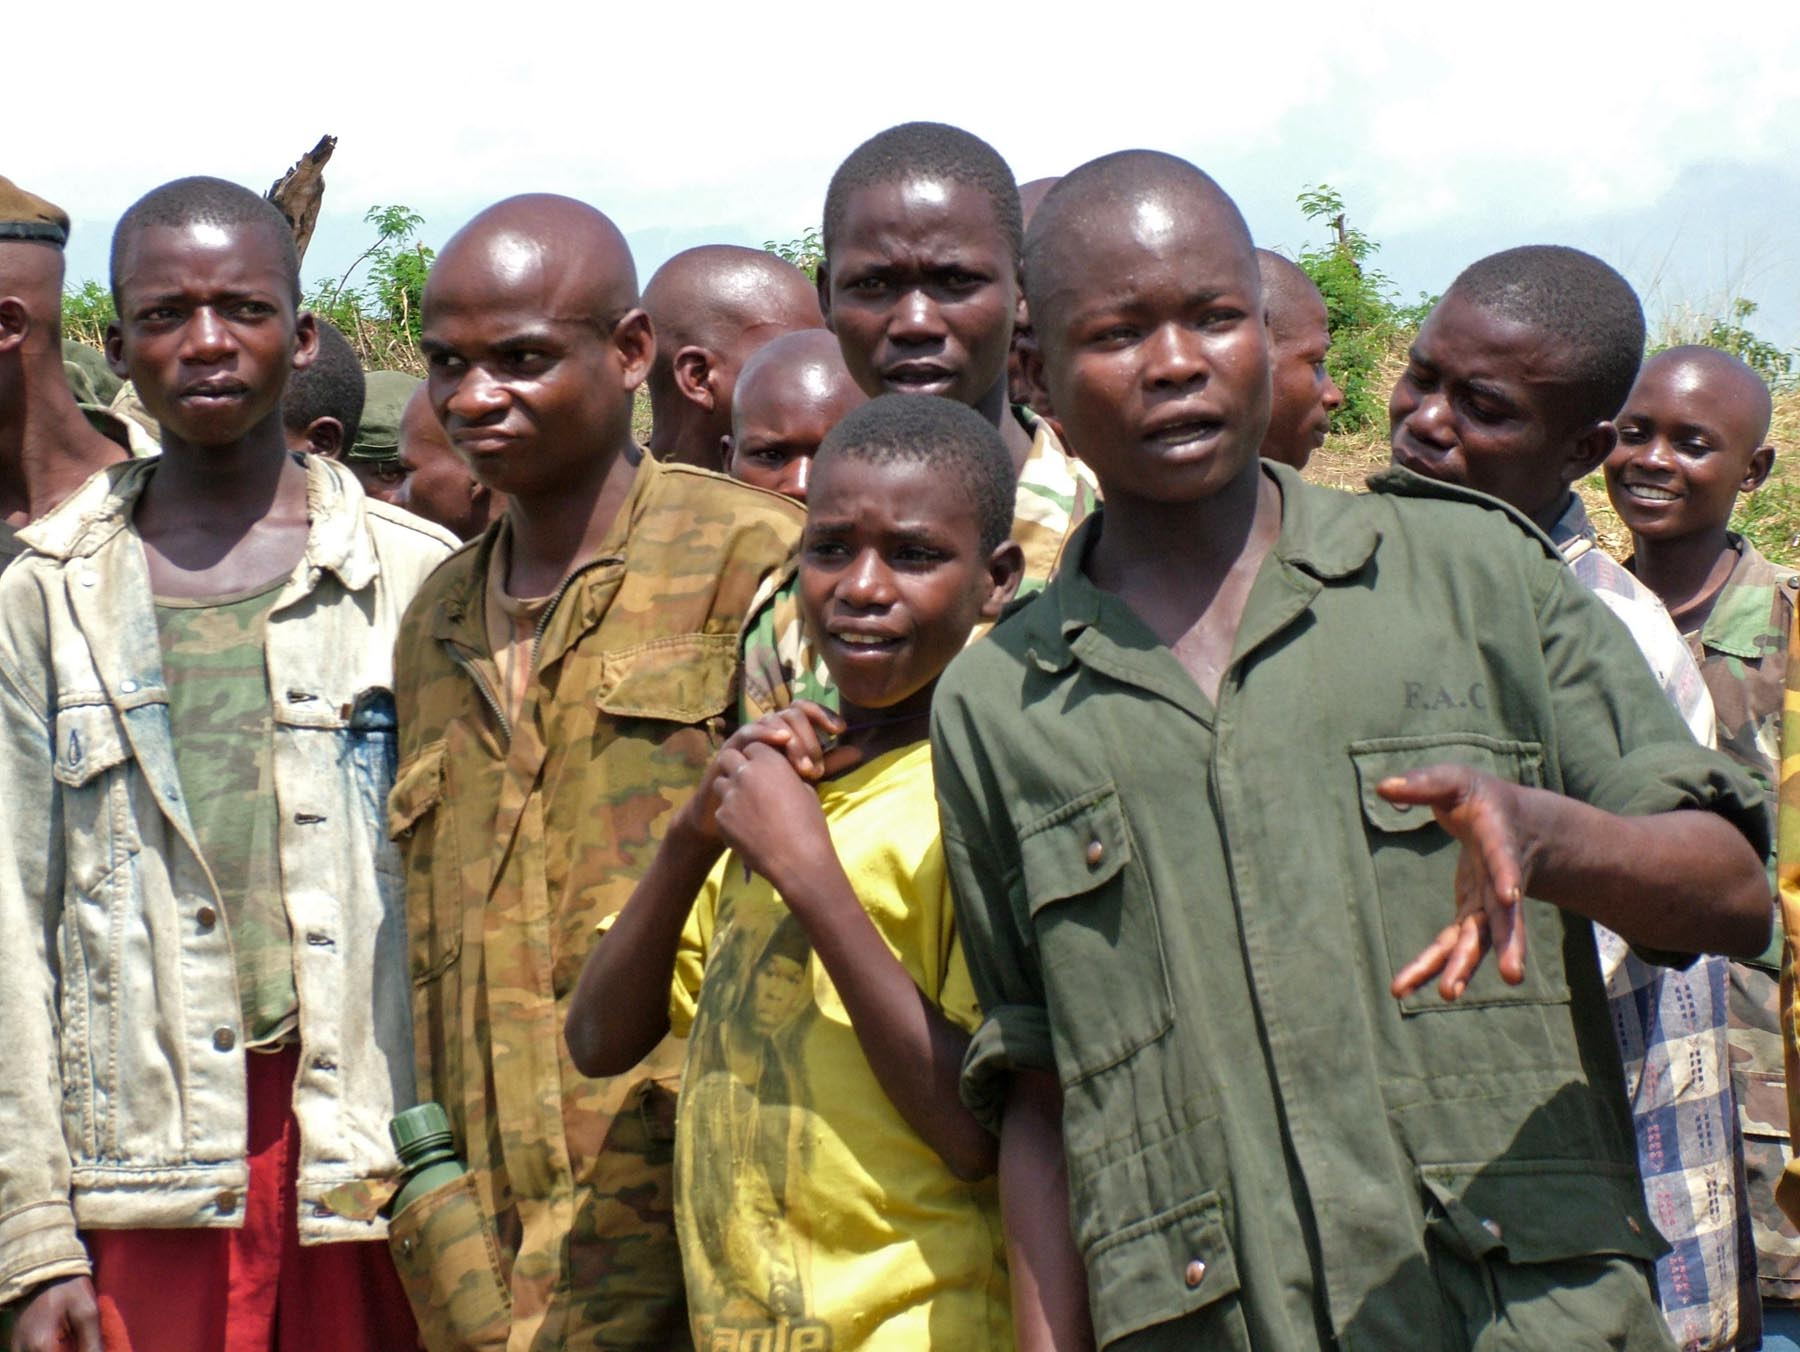 Lapsisotilaita Kongossa. Kuva: Wikimedia Commons.